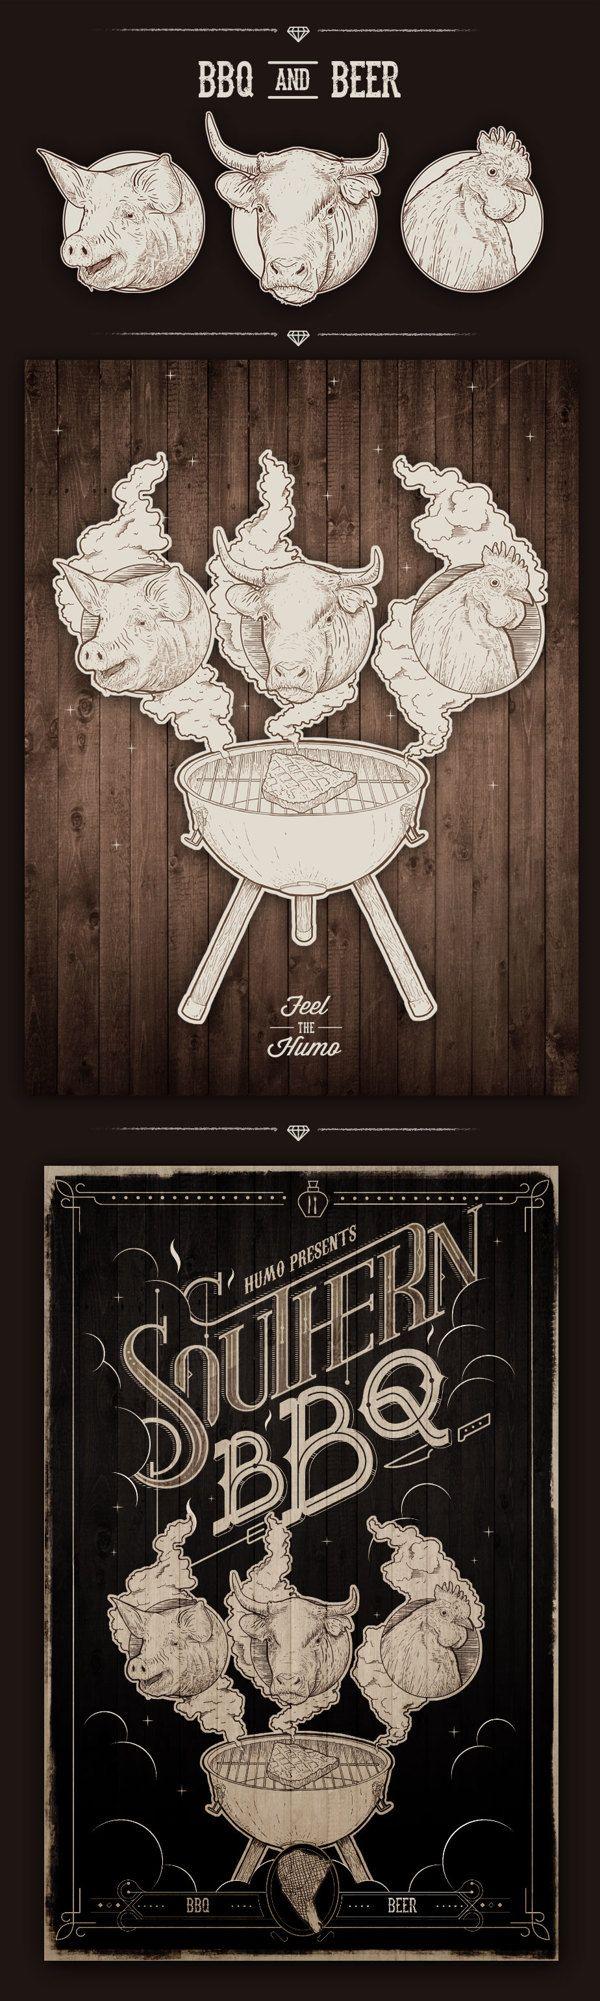 Southern BBQ / Humo by Mateo Rios, via Behance